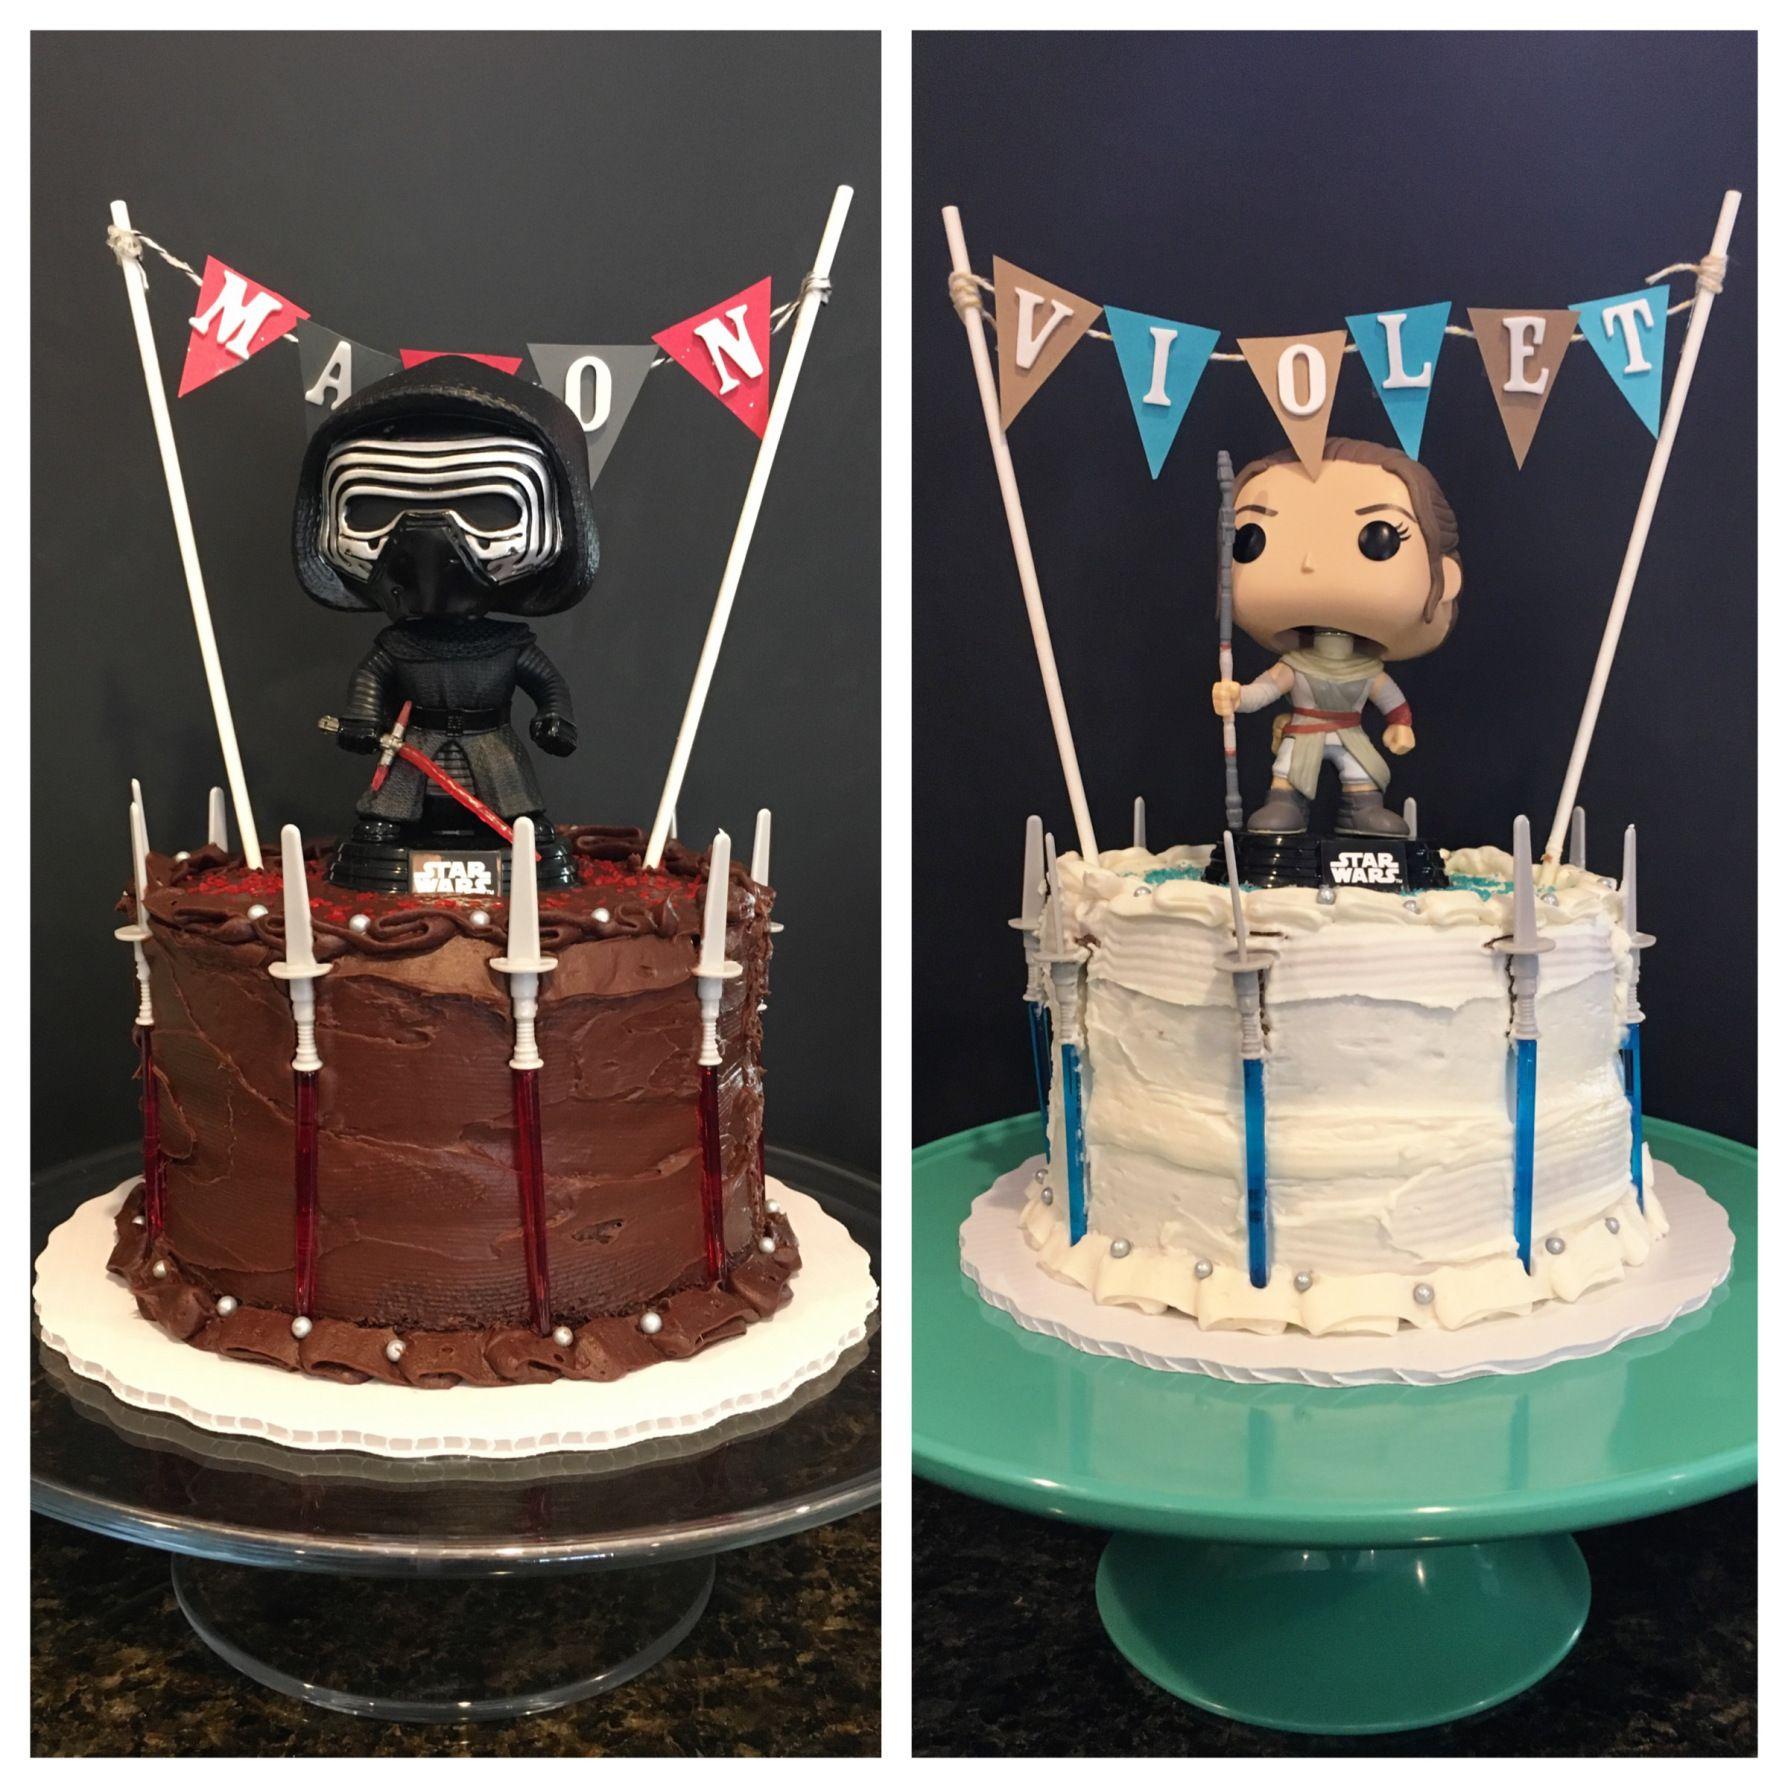 Homemade Batman Cake Ideas That Look Great Star Wars Birthday Cake